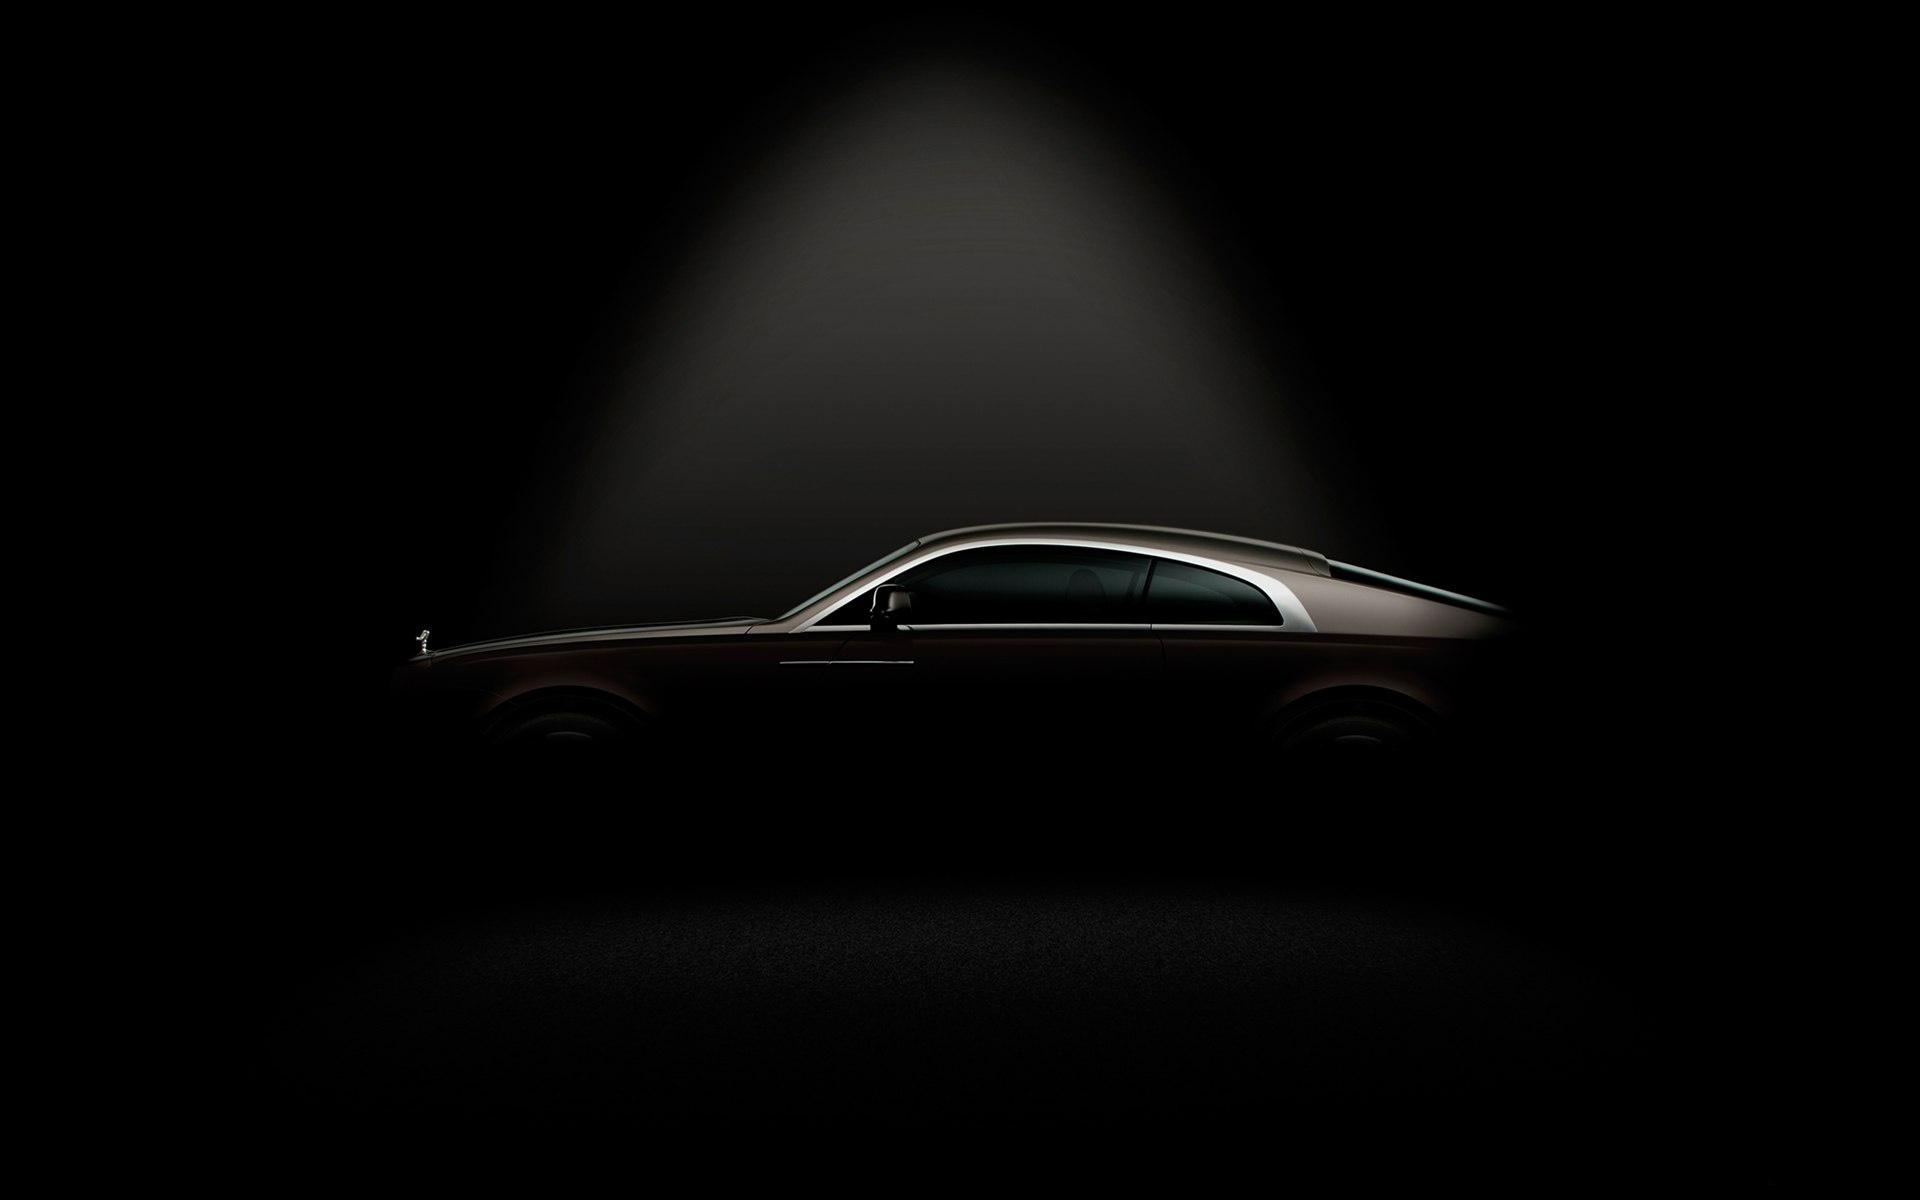 Classic Rolls Royce Car Hd Wallpaper My Site